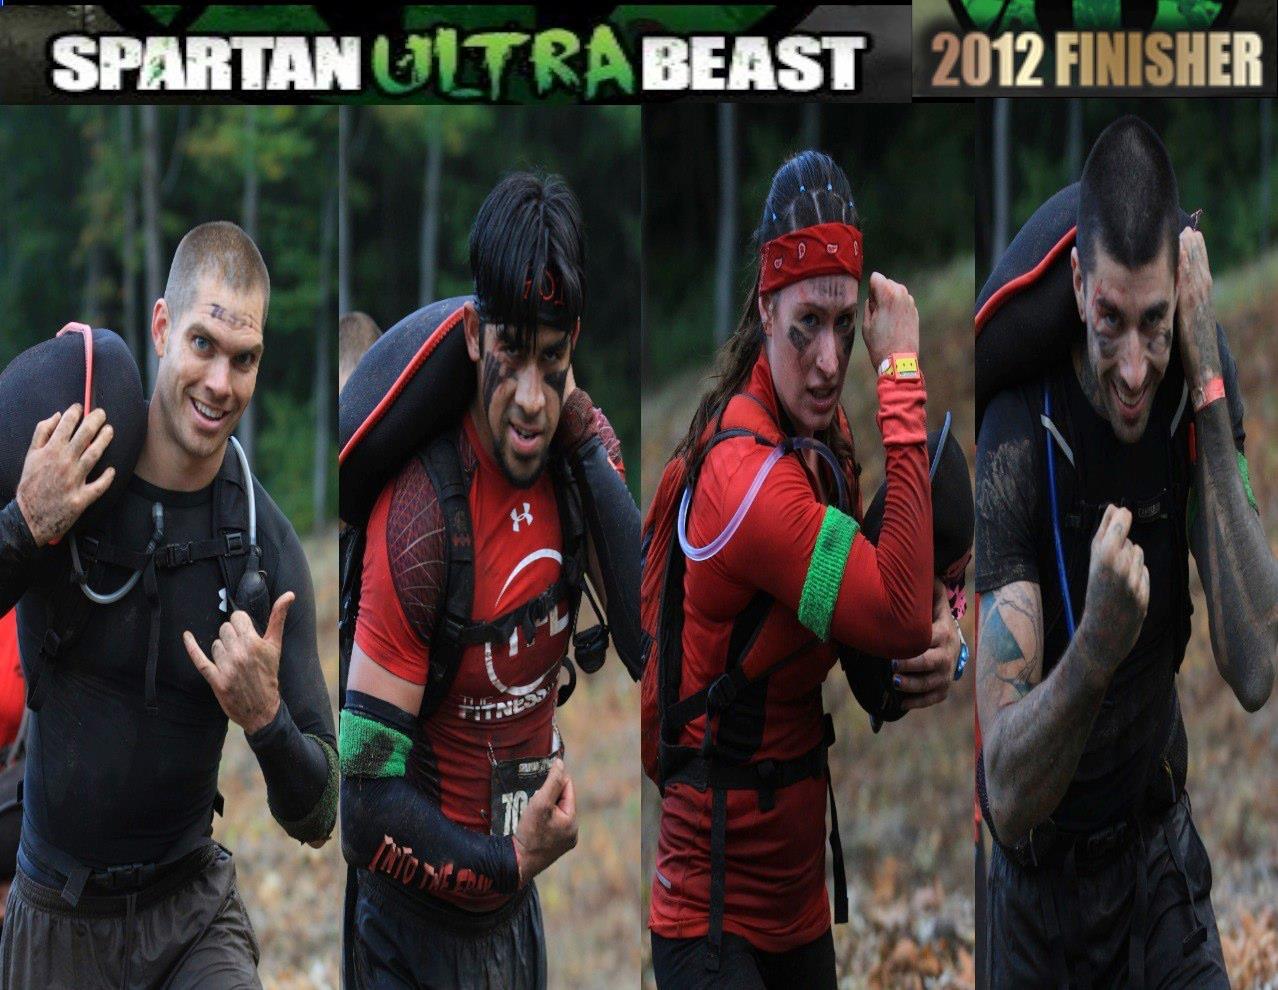 Spartan Ultra Beast Finishers 2012